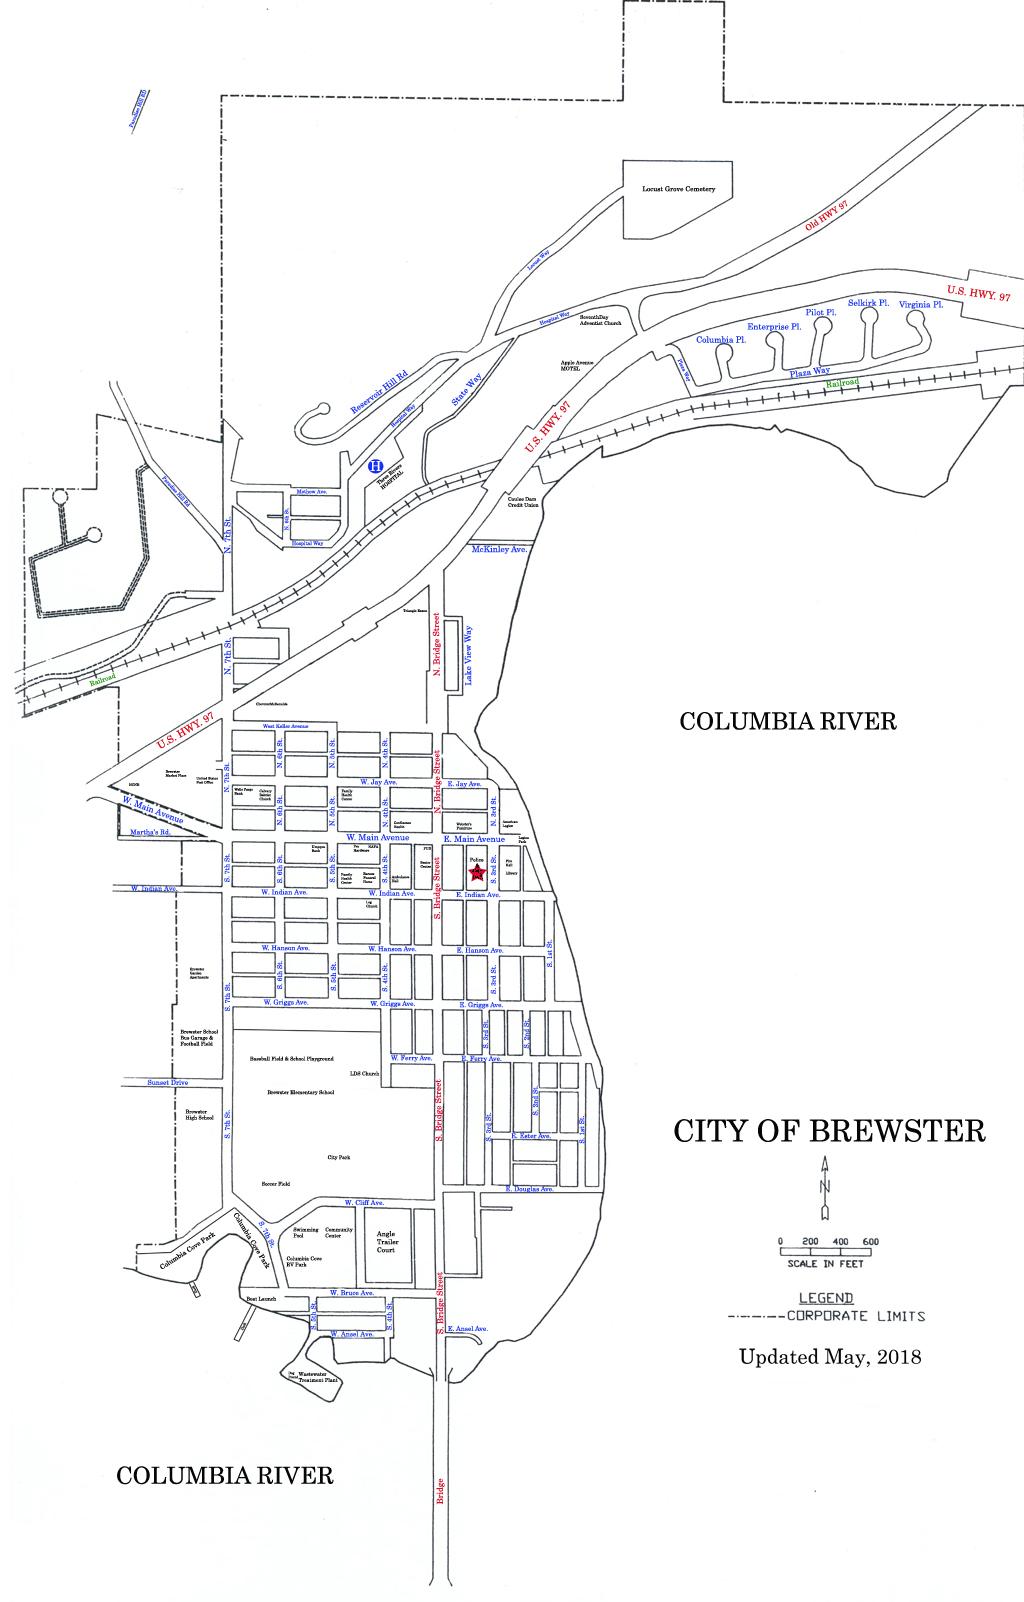 City of Brewster Street Map_medium size